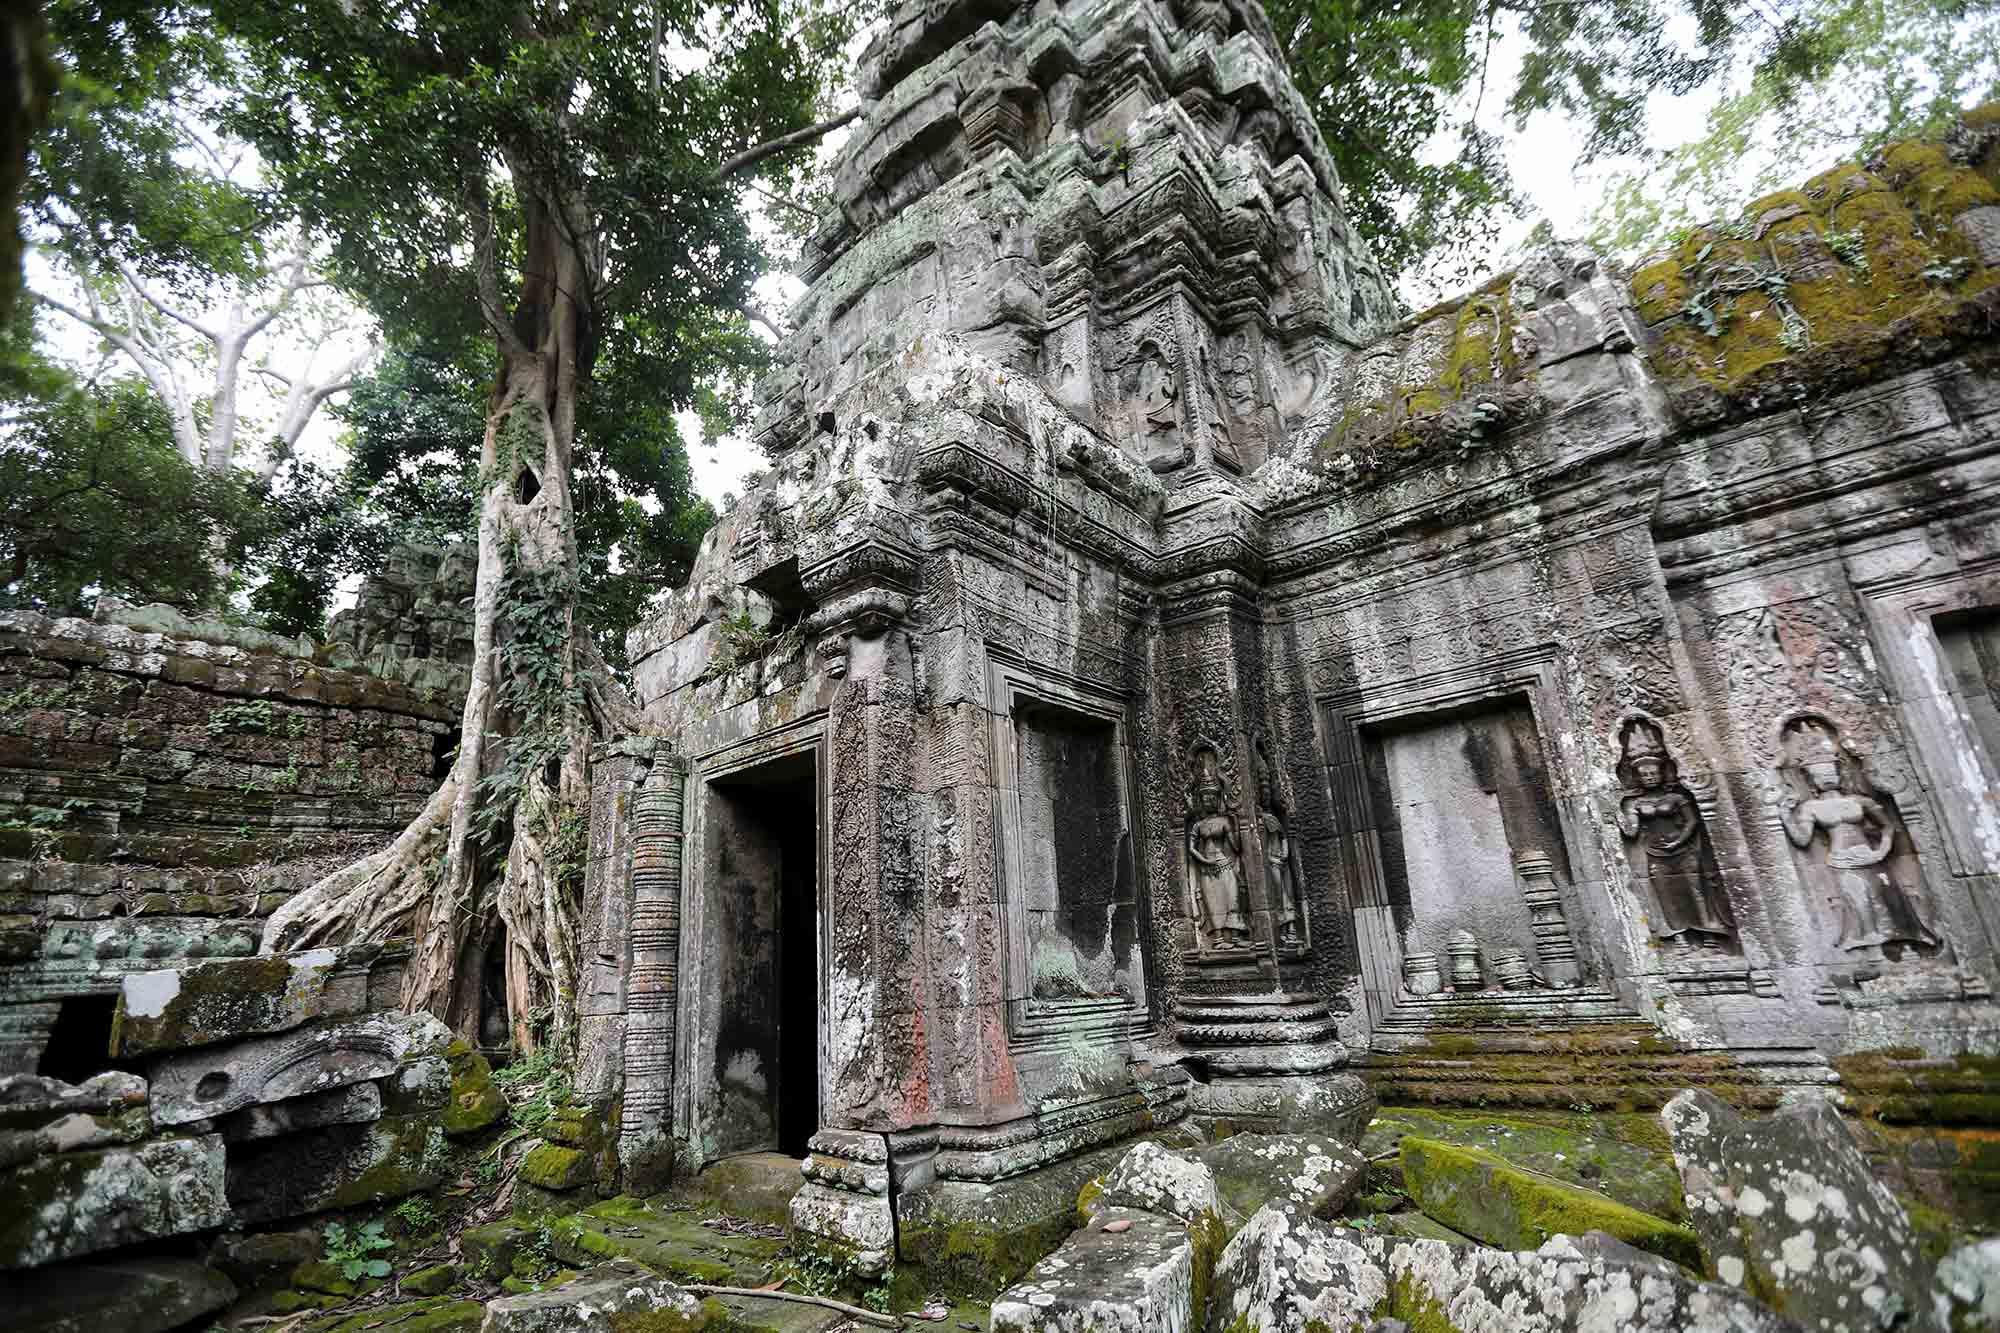 ta-phrom-temple-angkor-wat-cambodia